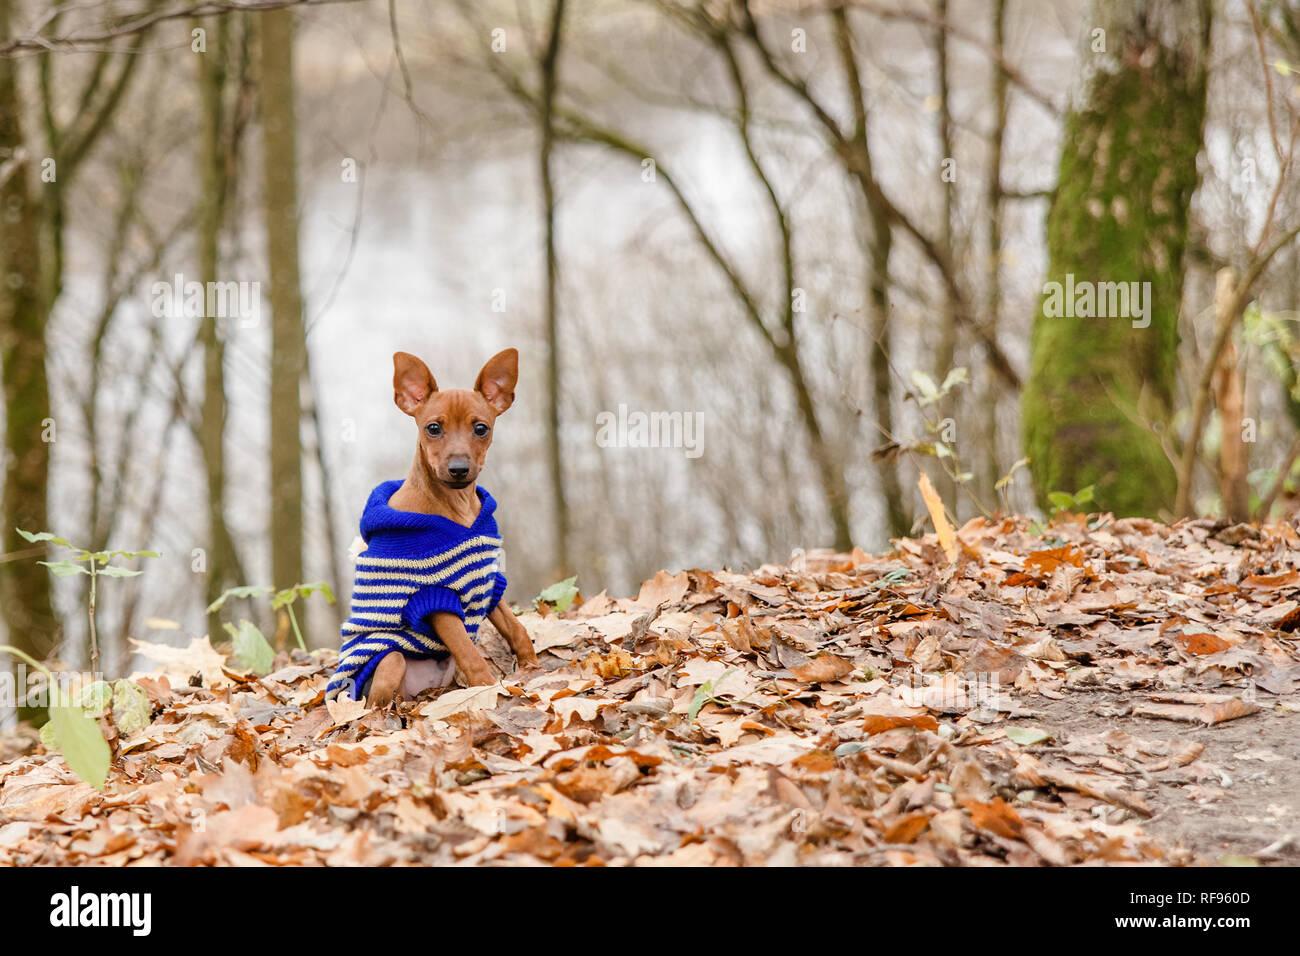 18d0b46d34c1 Gracioso perro terrier, un juguete, un elegante vestido perrita en un  jersey azul,